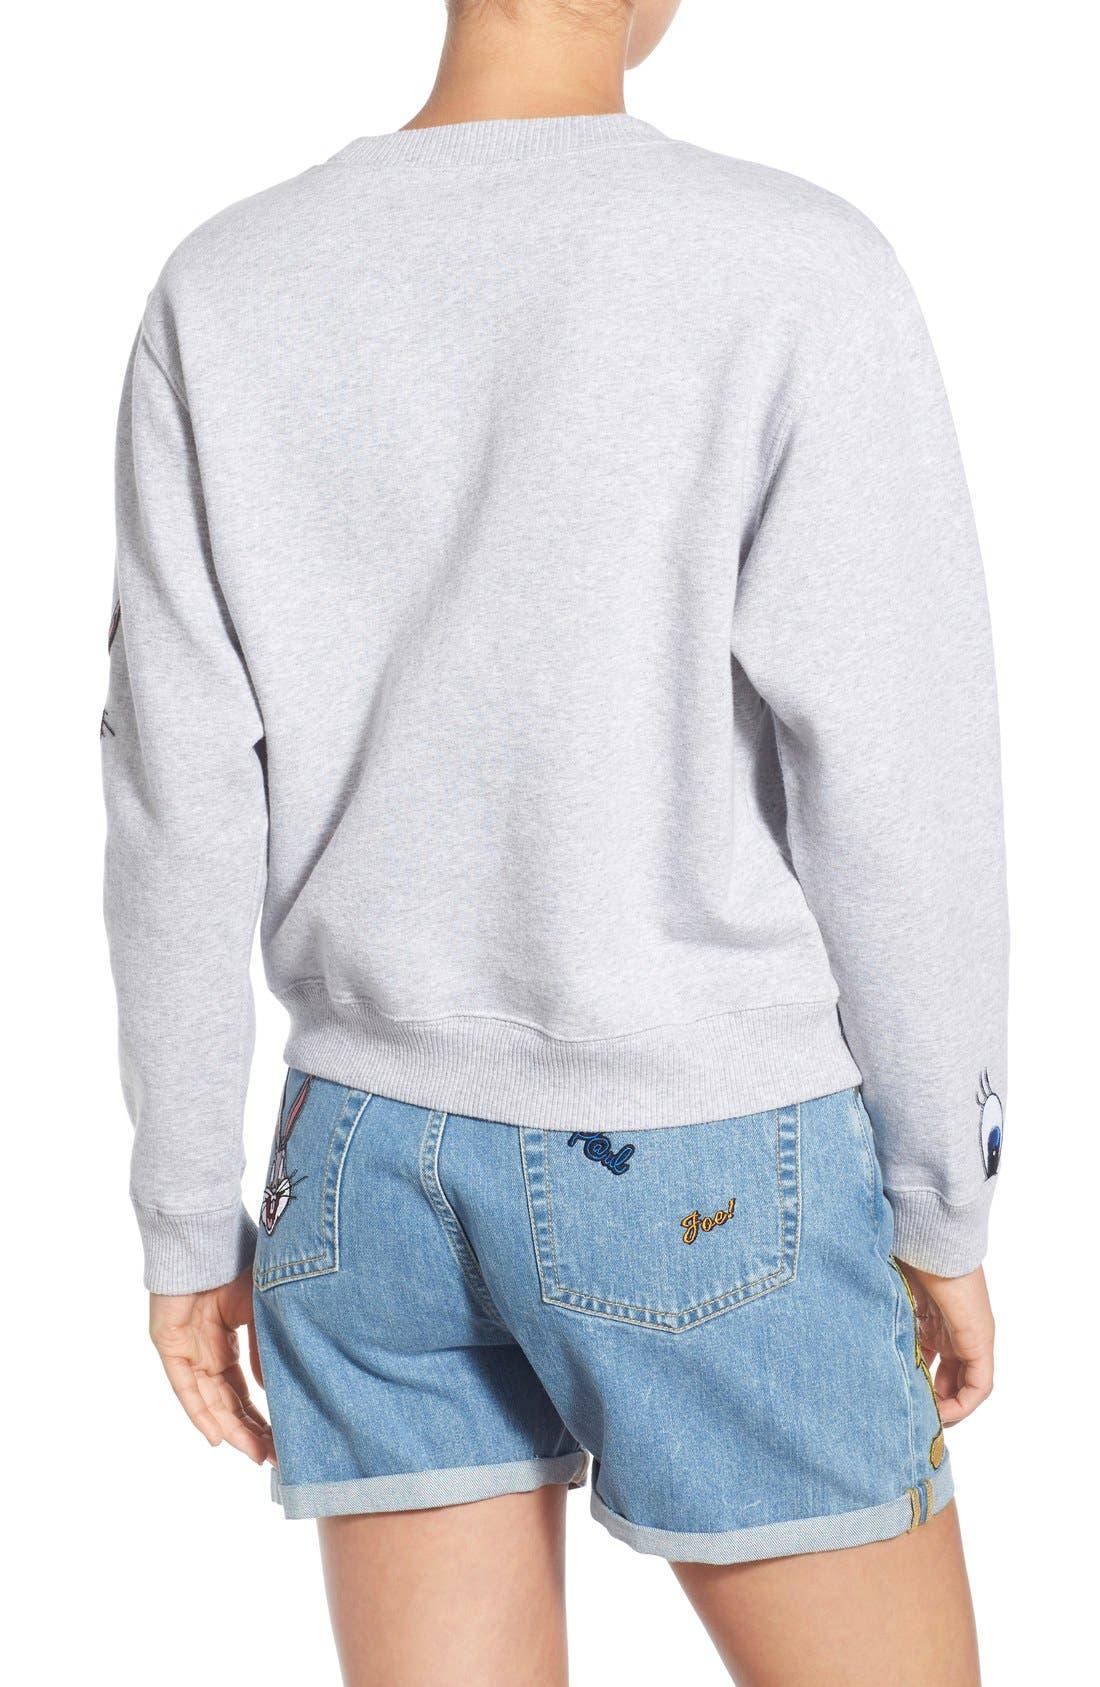 Alternate Image 2  - Paul & Joe Sister 'So Funny' Crewneck Cotton Sweatshirt